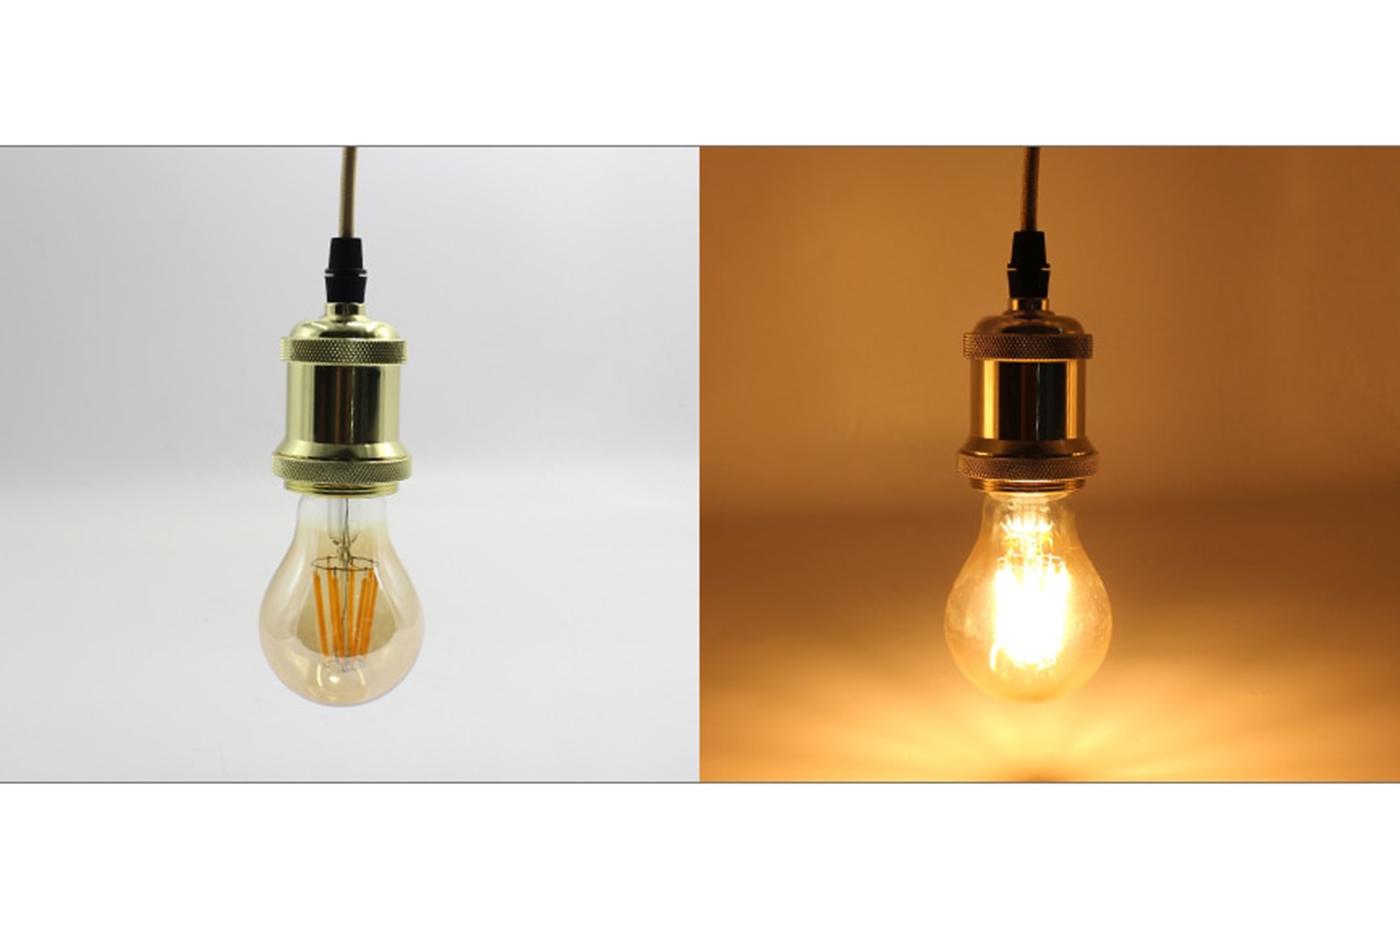 Lampadario lampadario lampadario sospensione ghiaia lampade